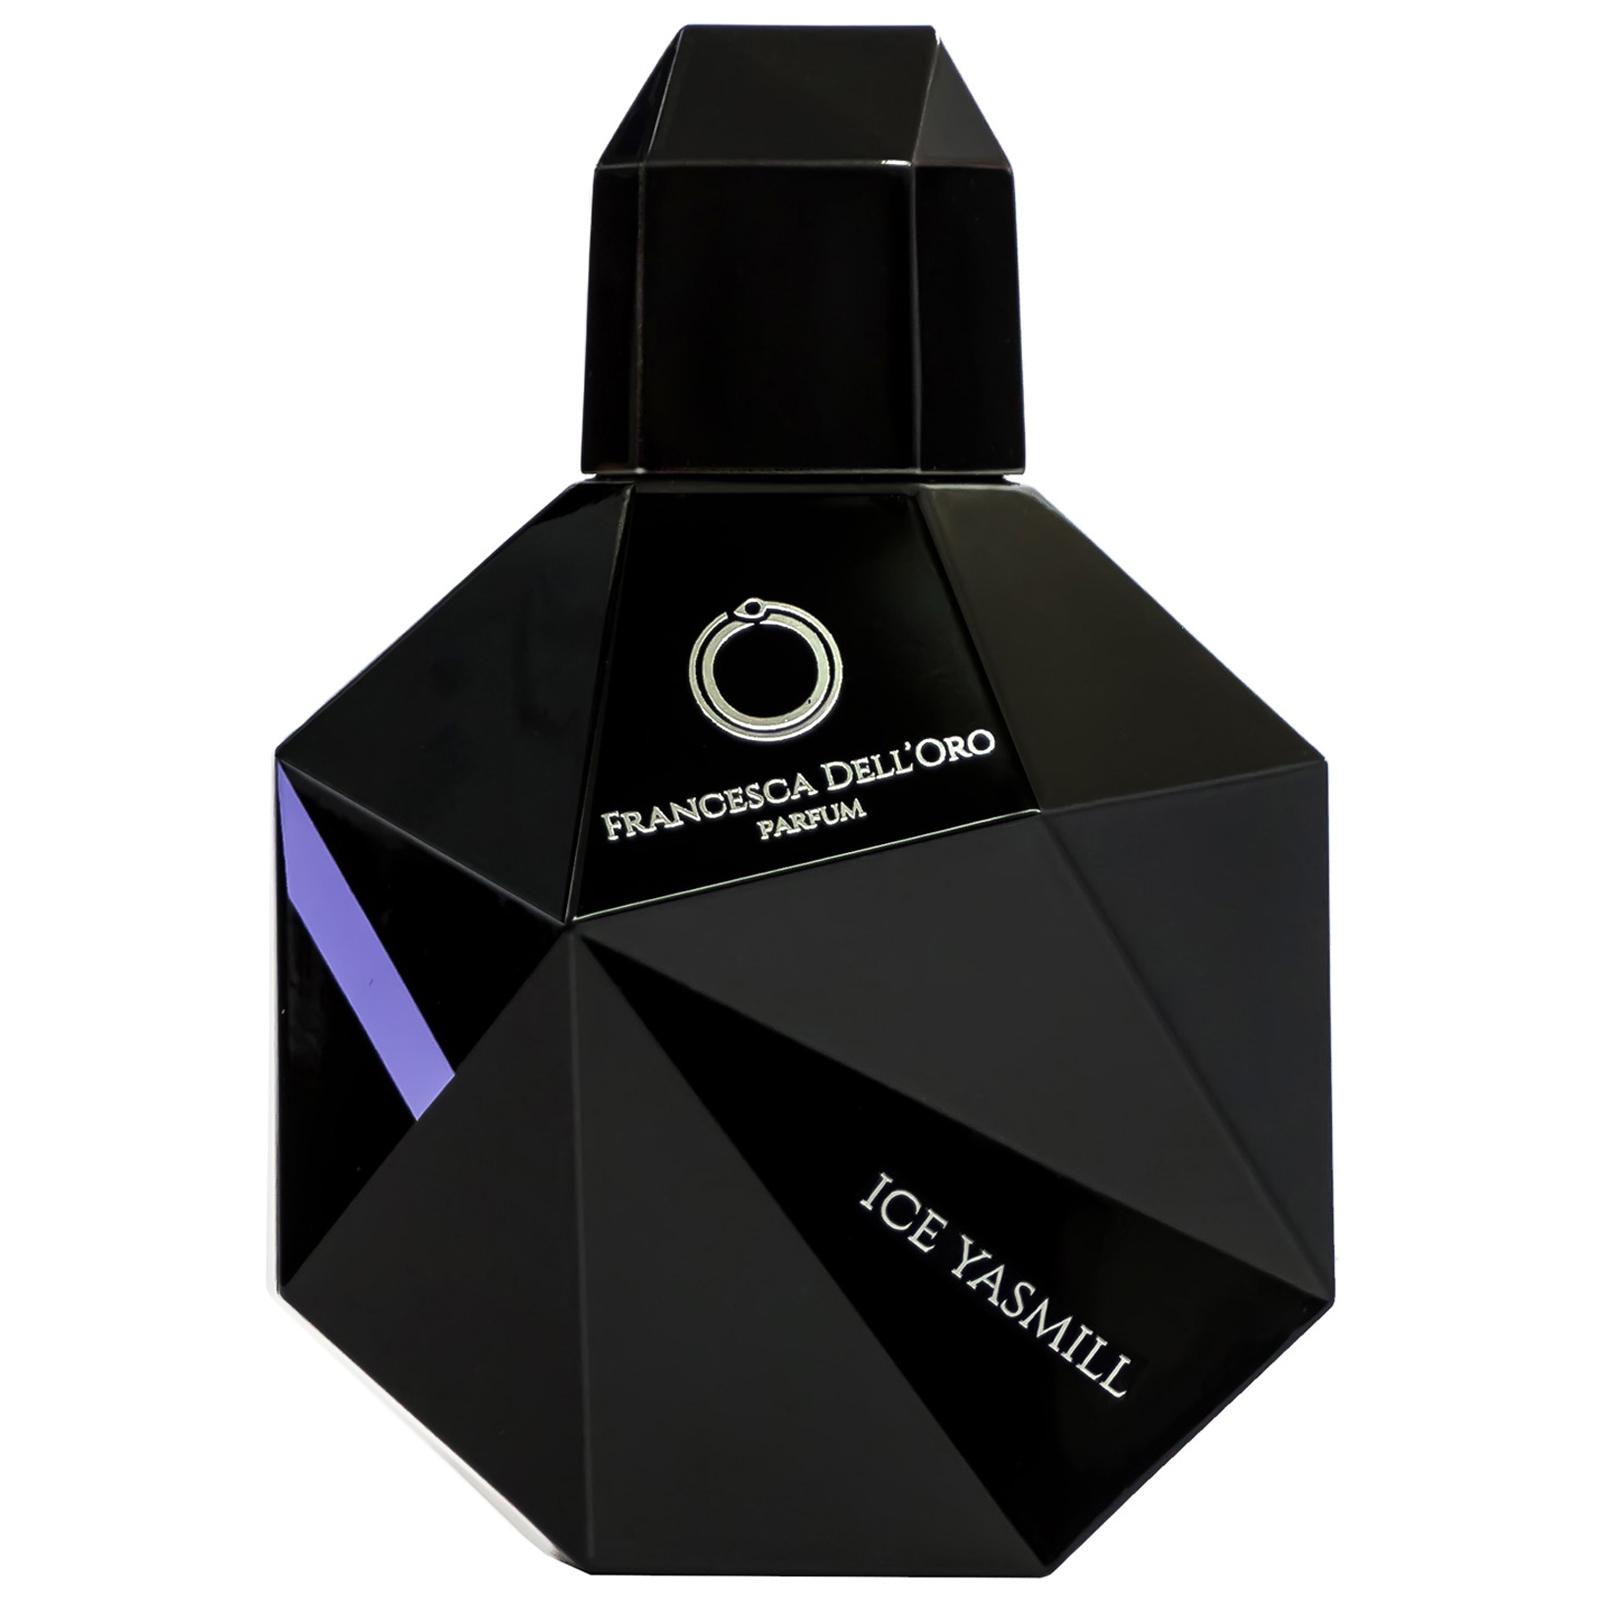 Ice yasmill profumo eau de parfum 100 ml